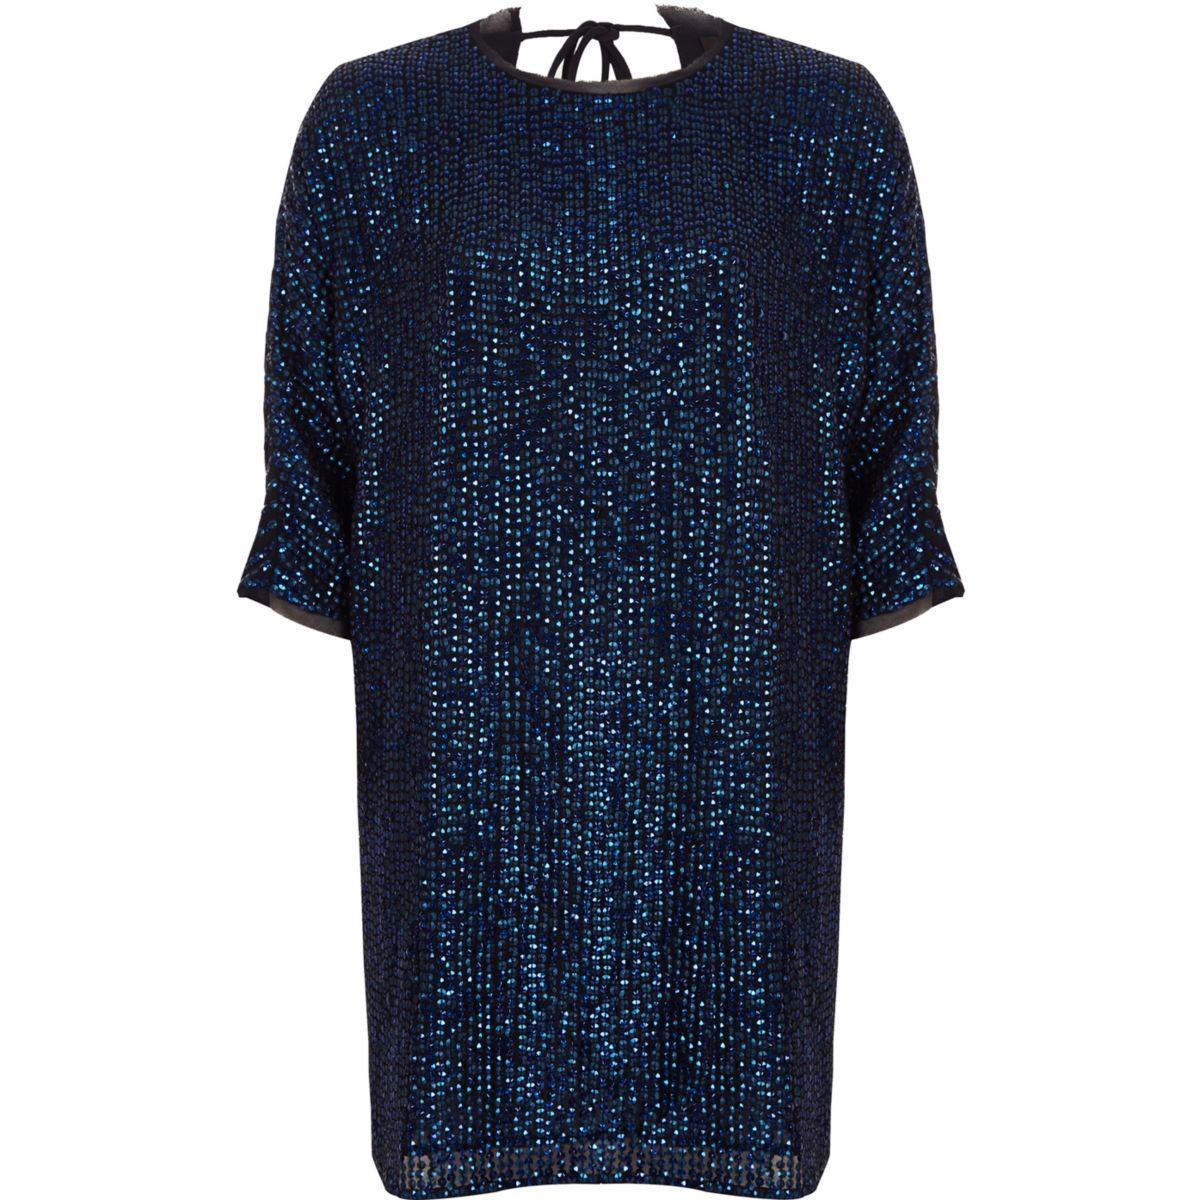 Navy embellished swing T-shirt dress